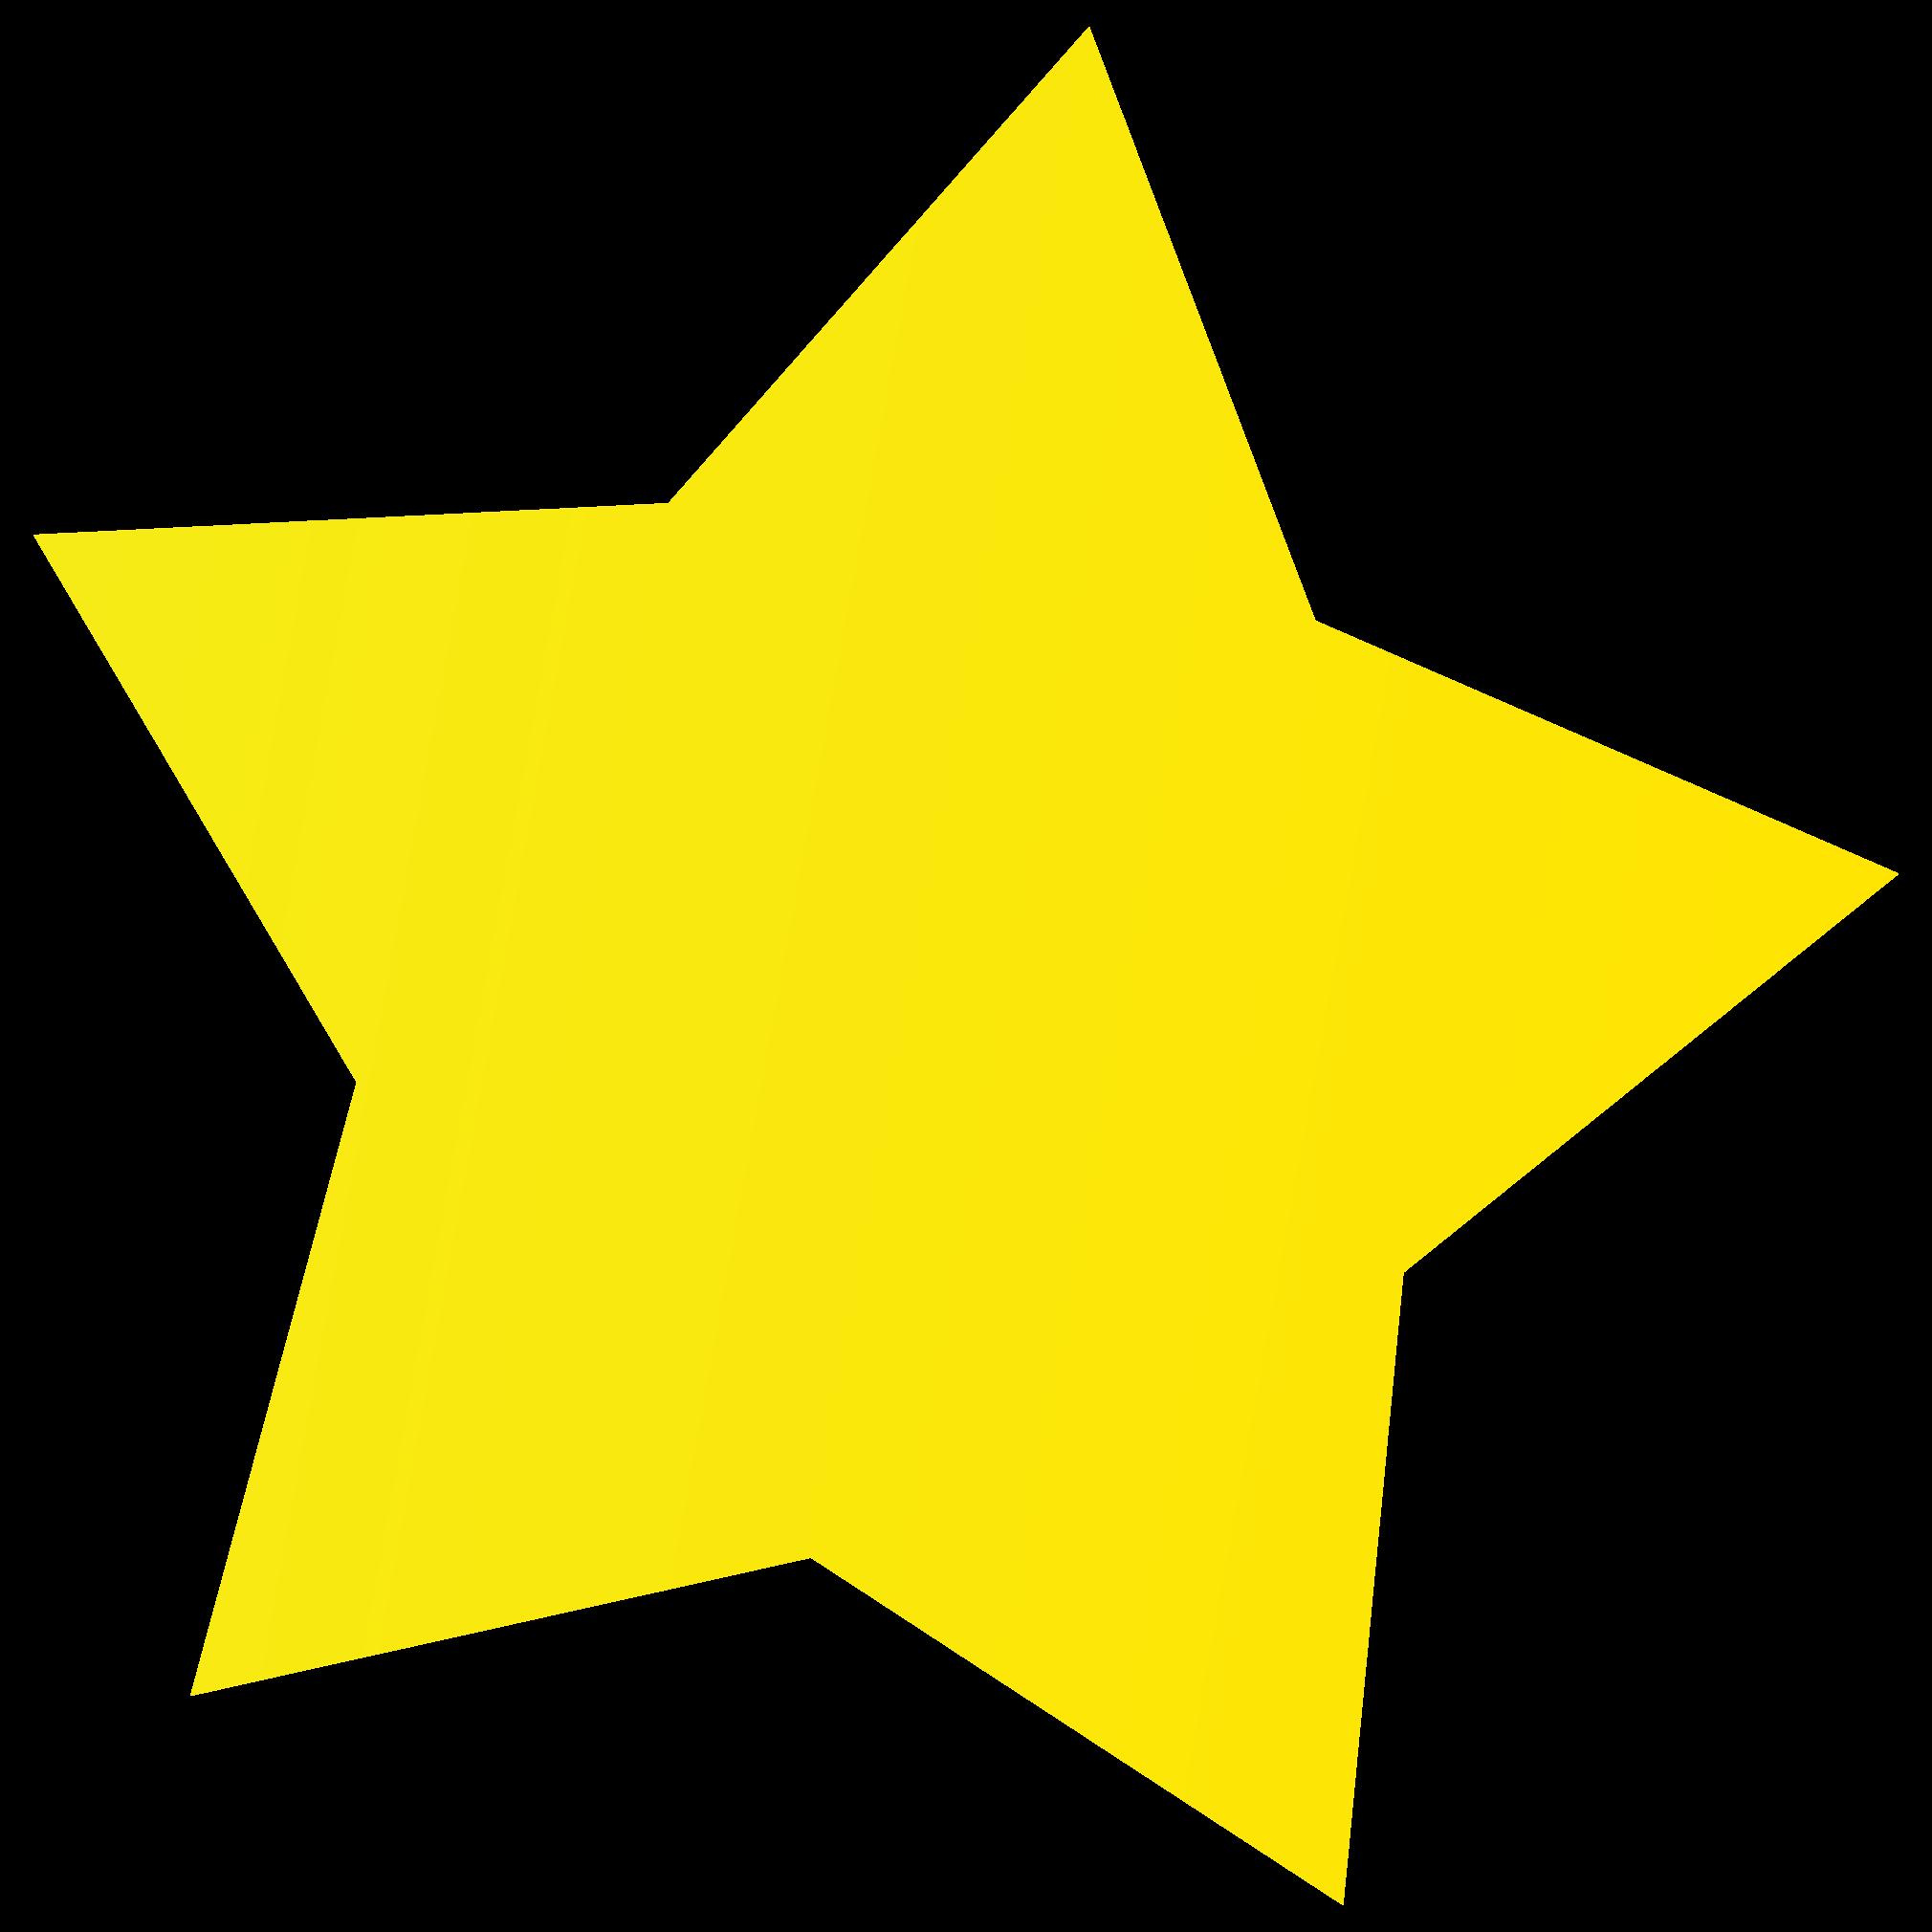 clip art star png clipart best